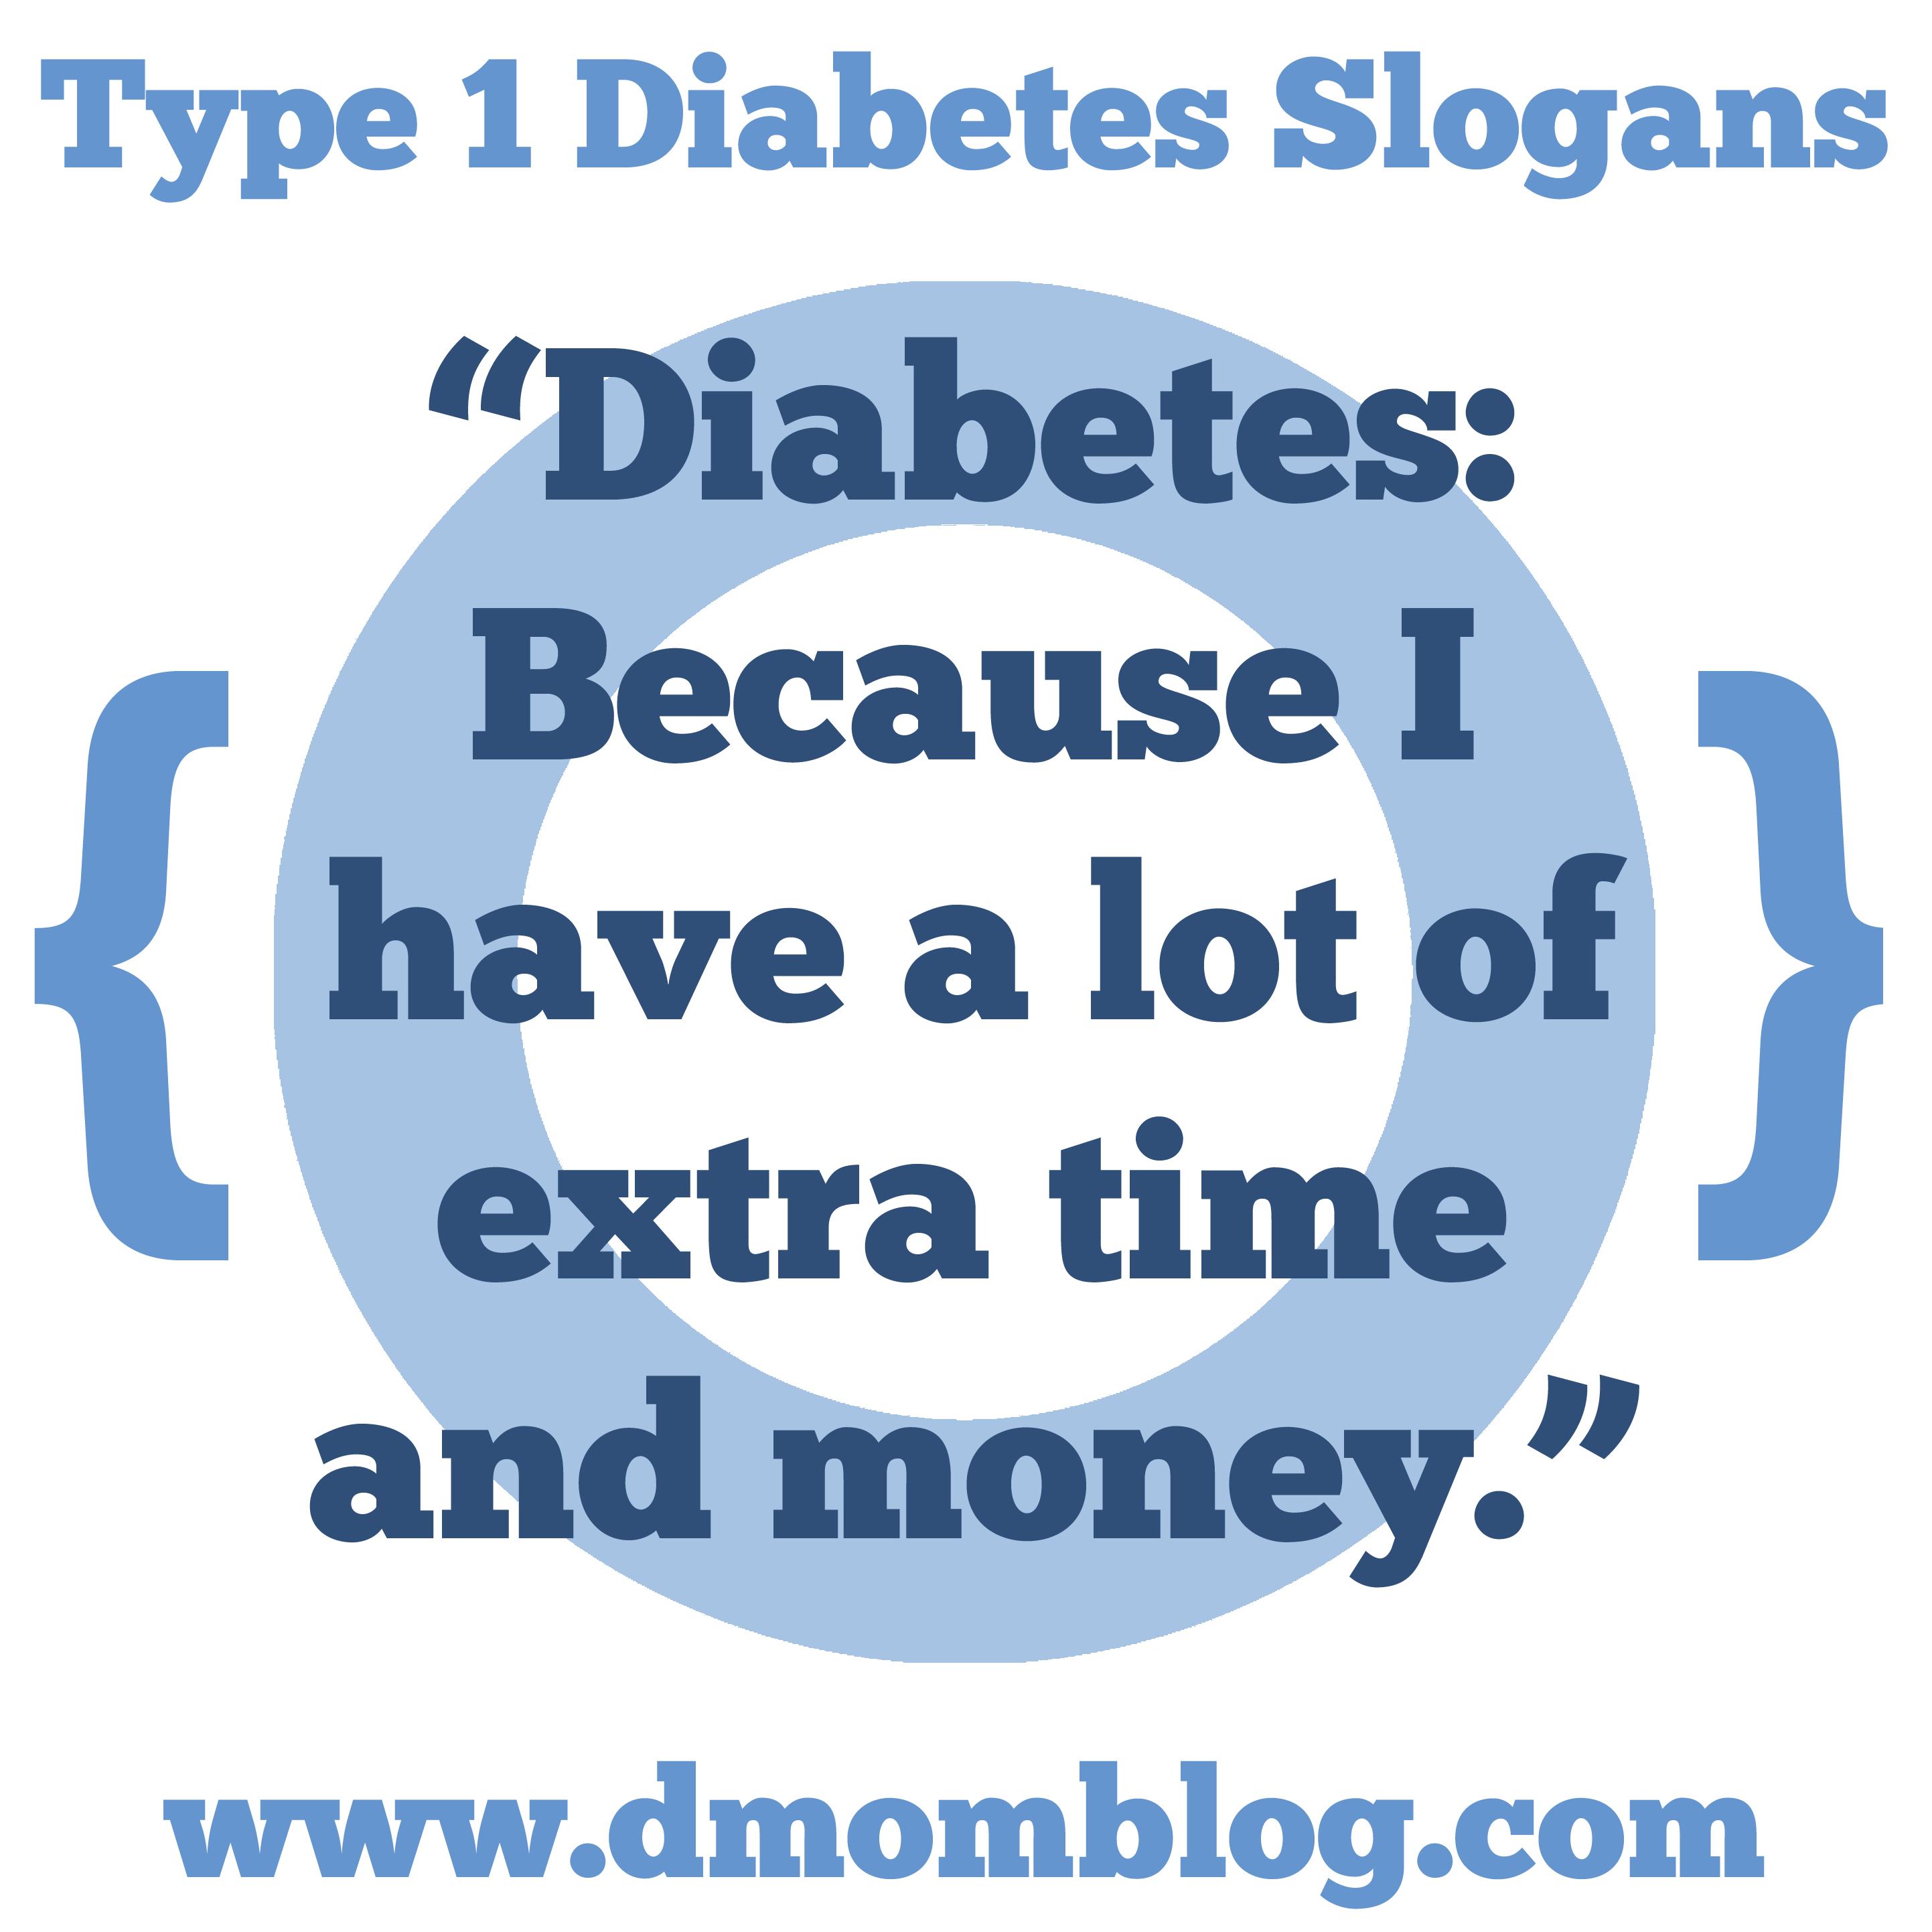 merudgifter hasta diabetesmad